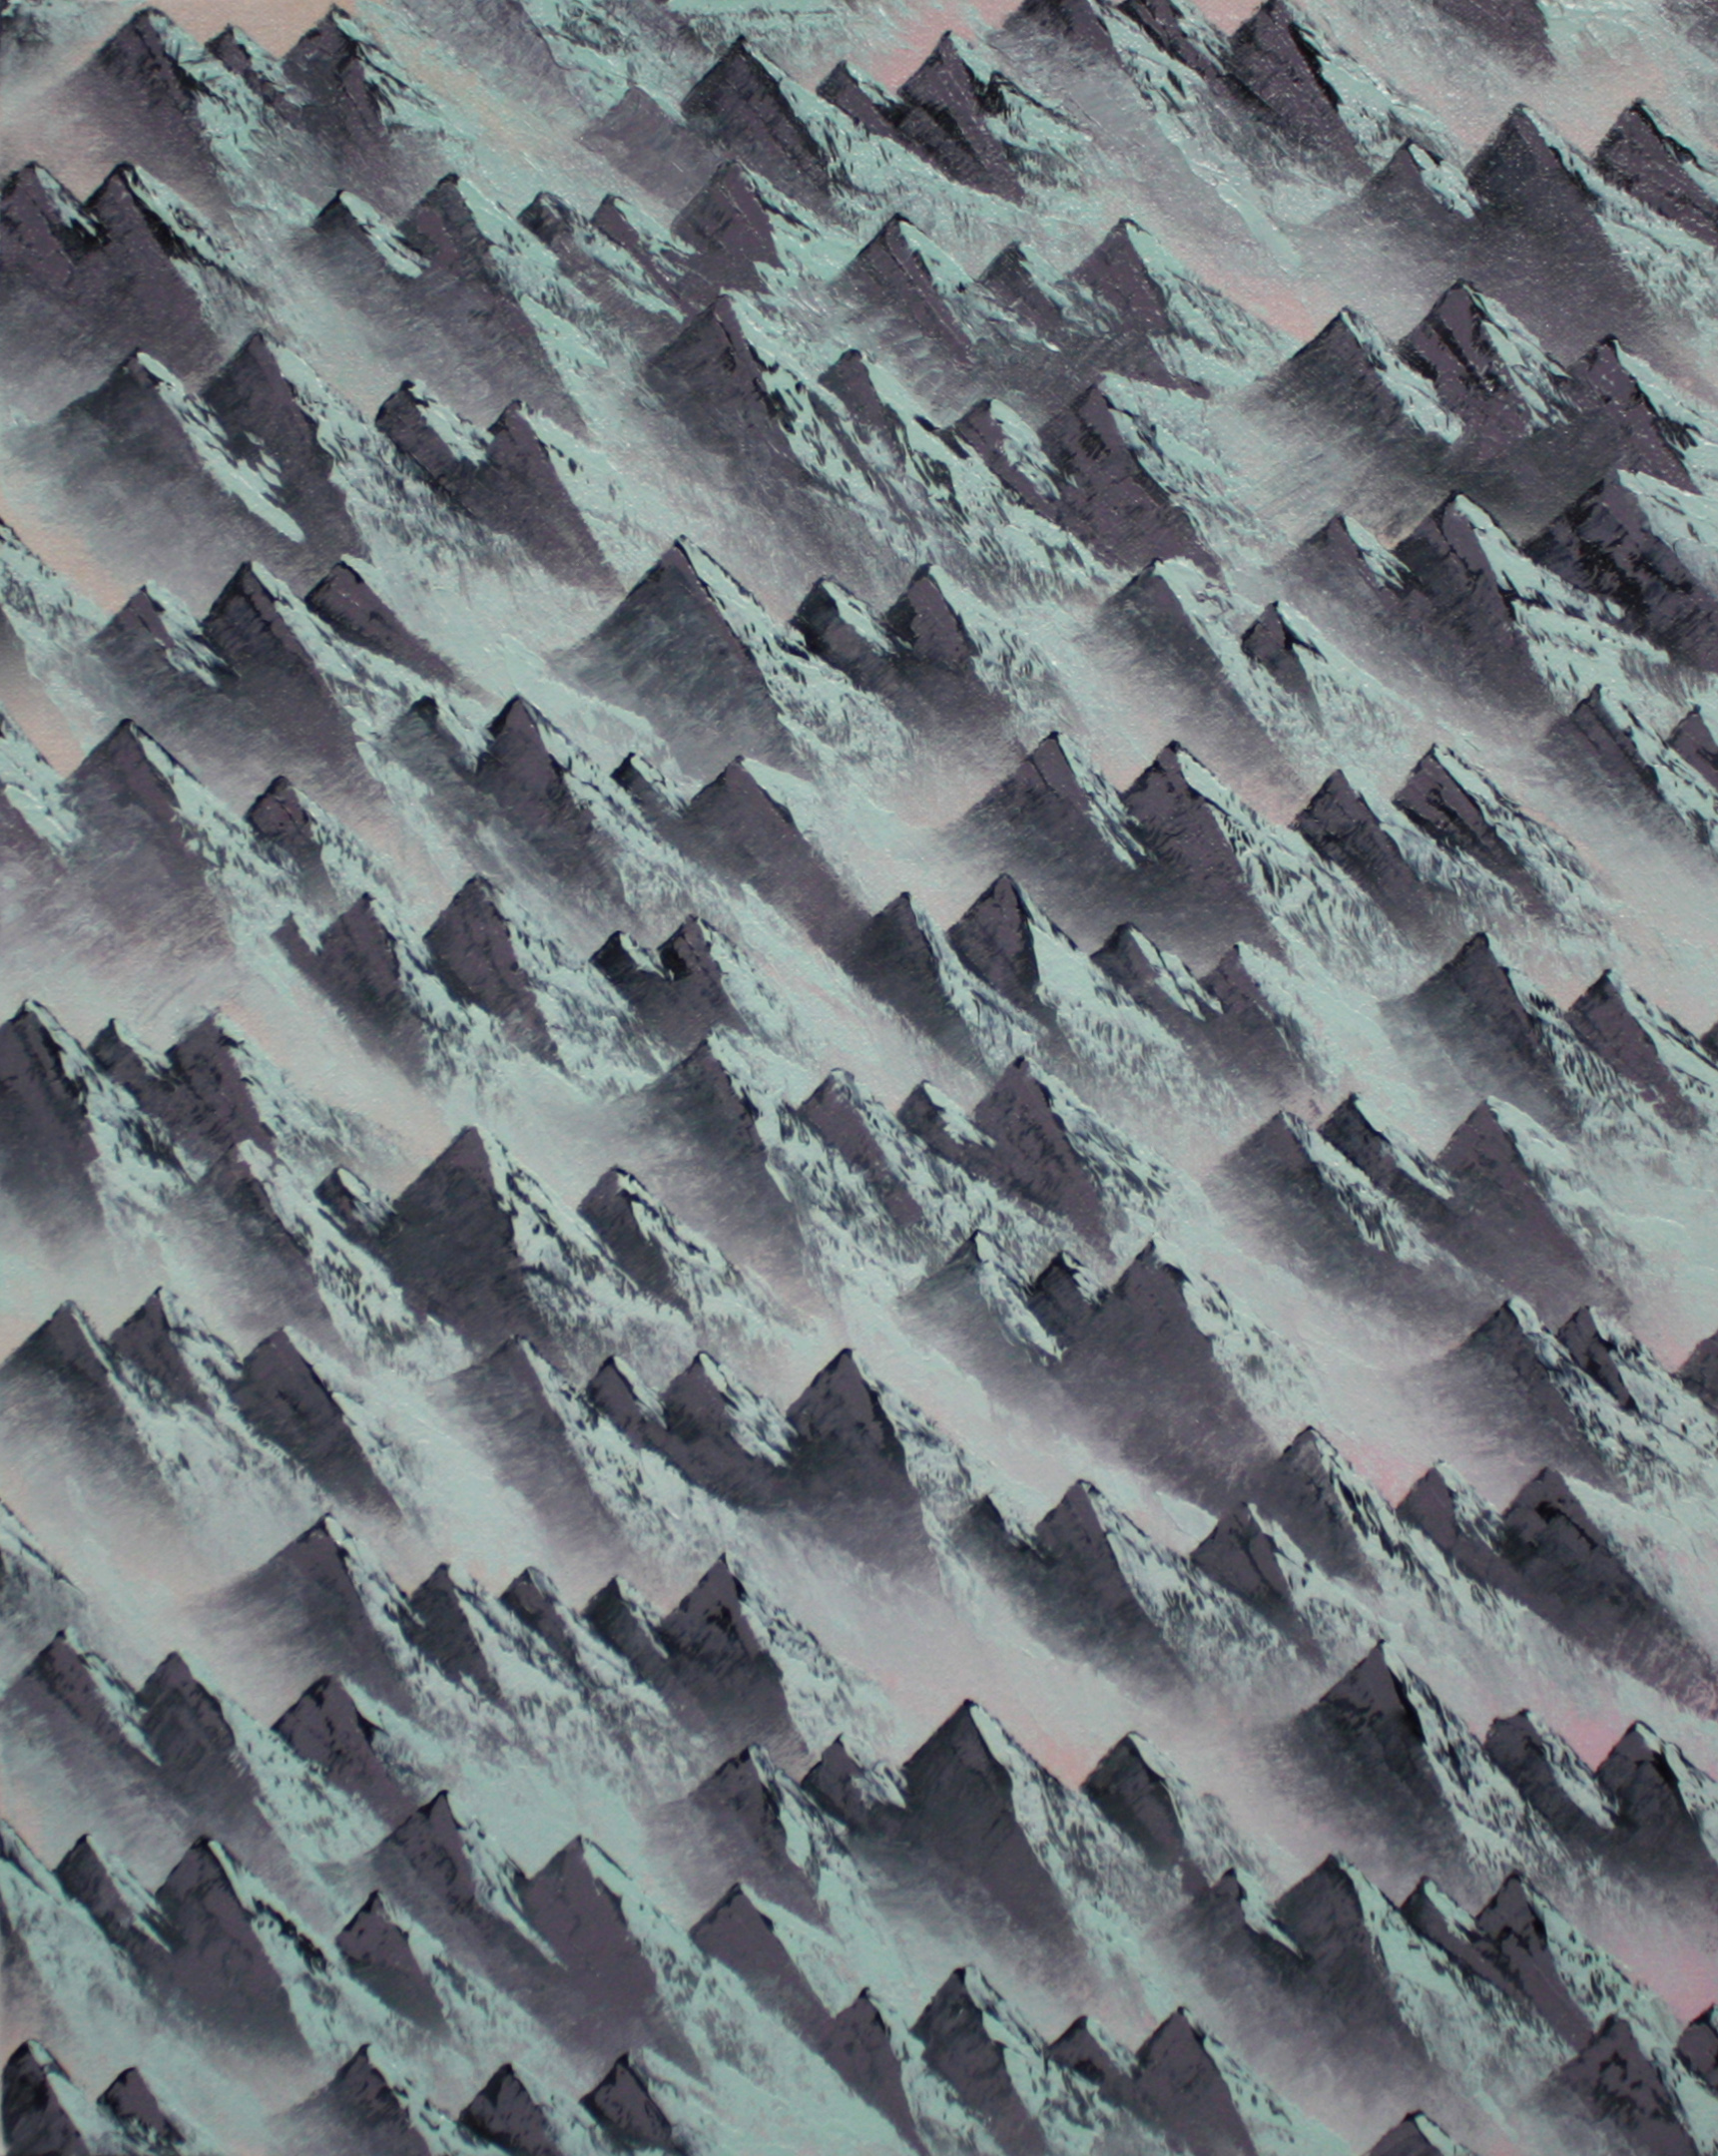 Untitled_(Alpine) #2-1